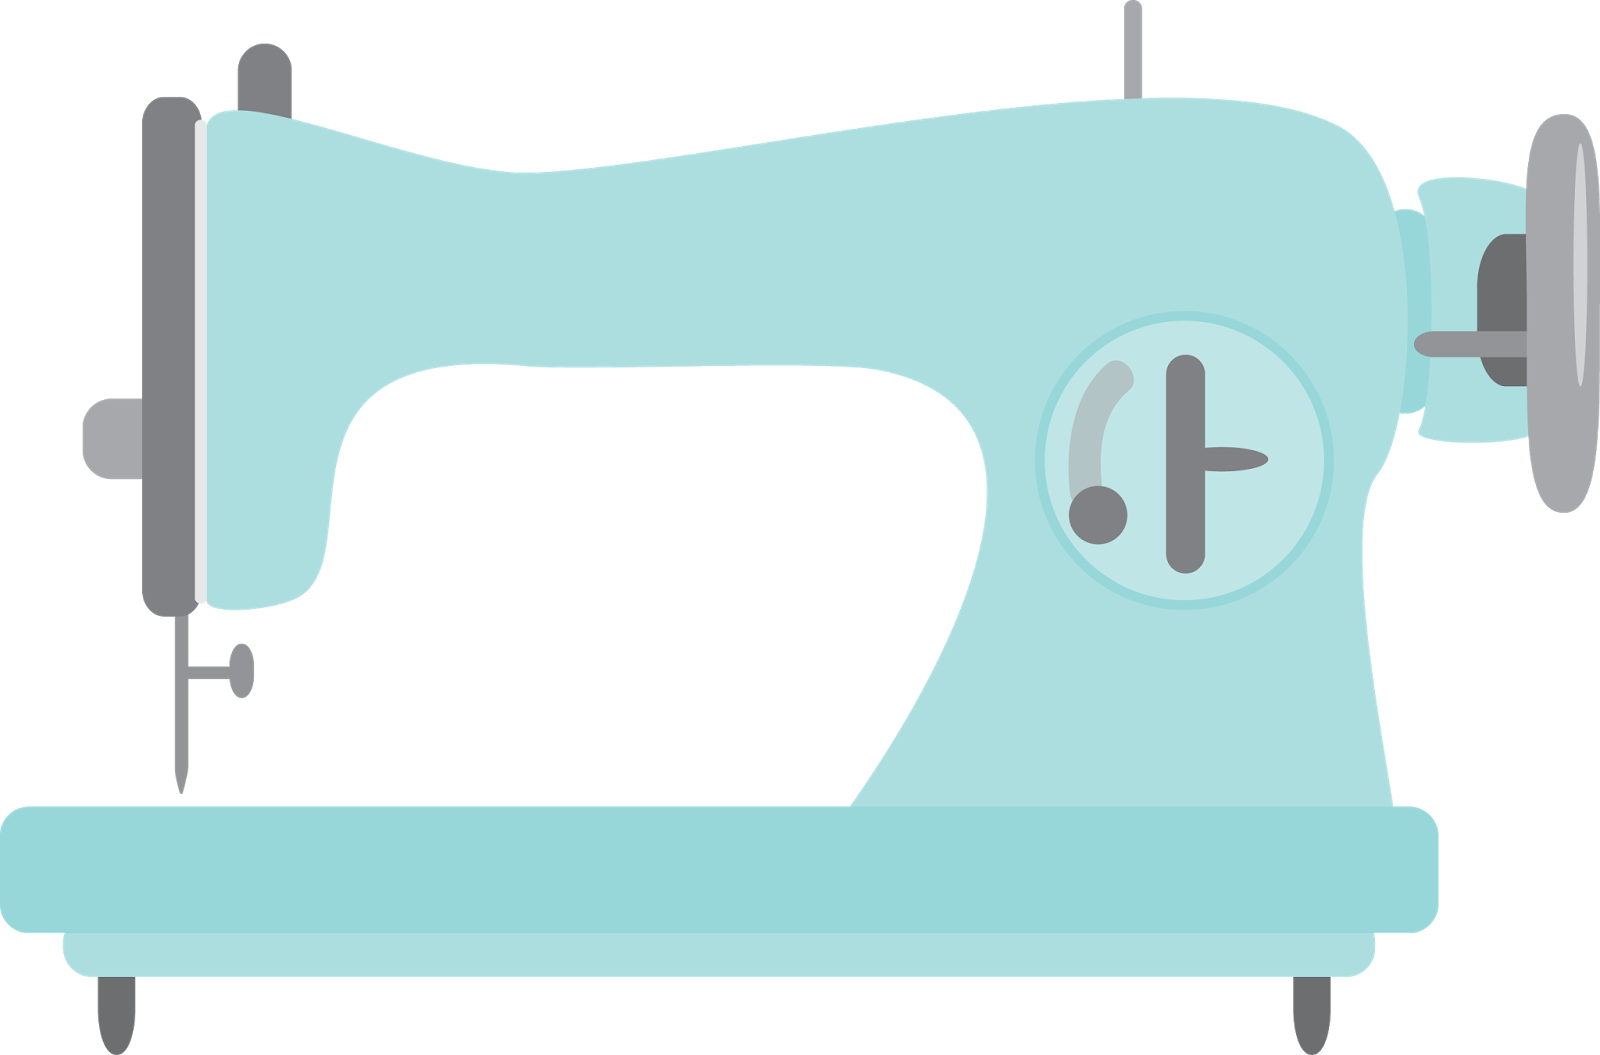 Crafts clipart sewing box. Sgblogosfera maria jose arg